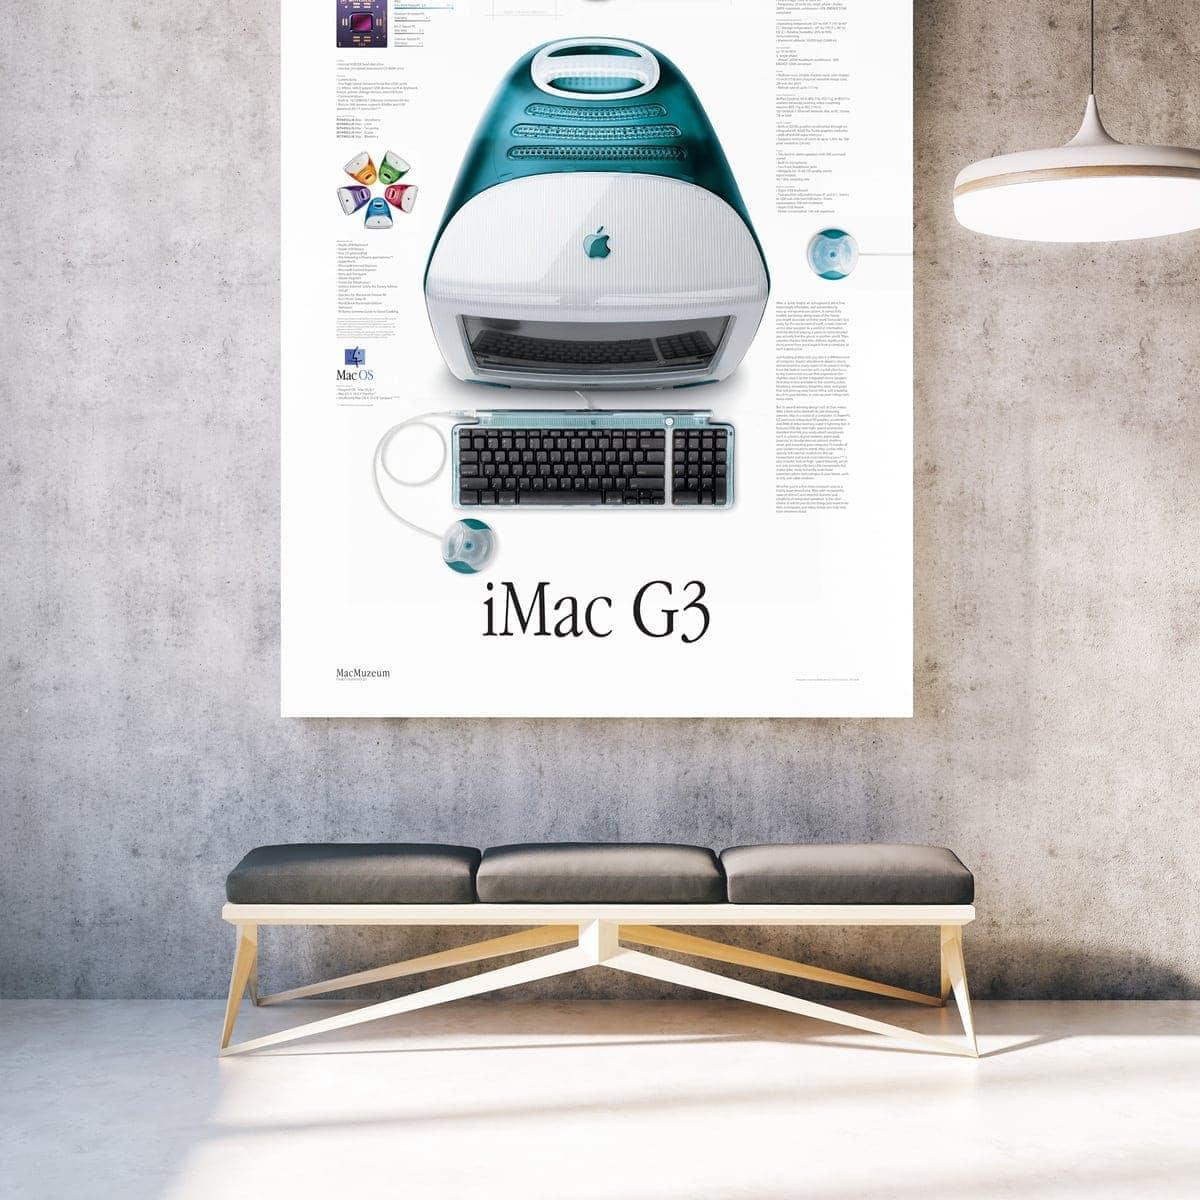 iMac G3 poster in frame